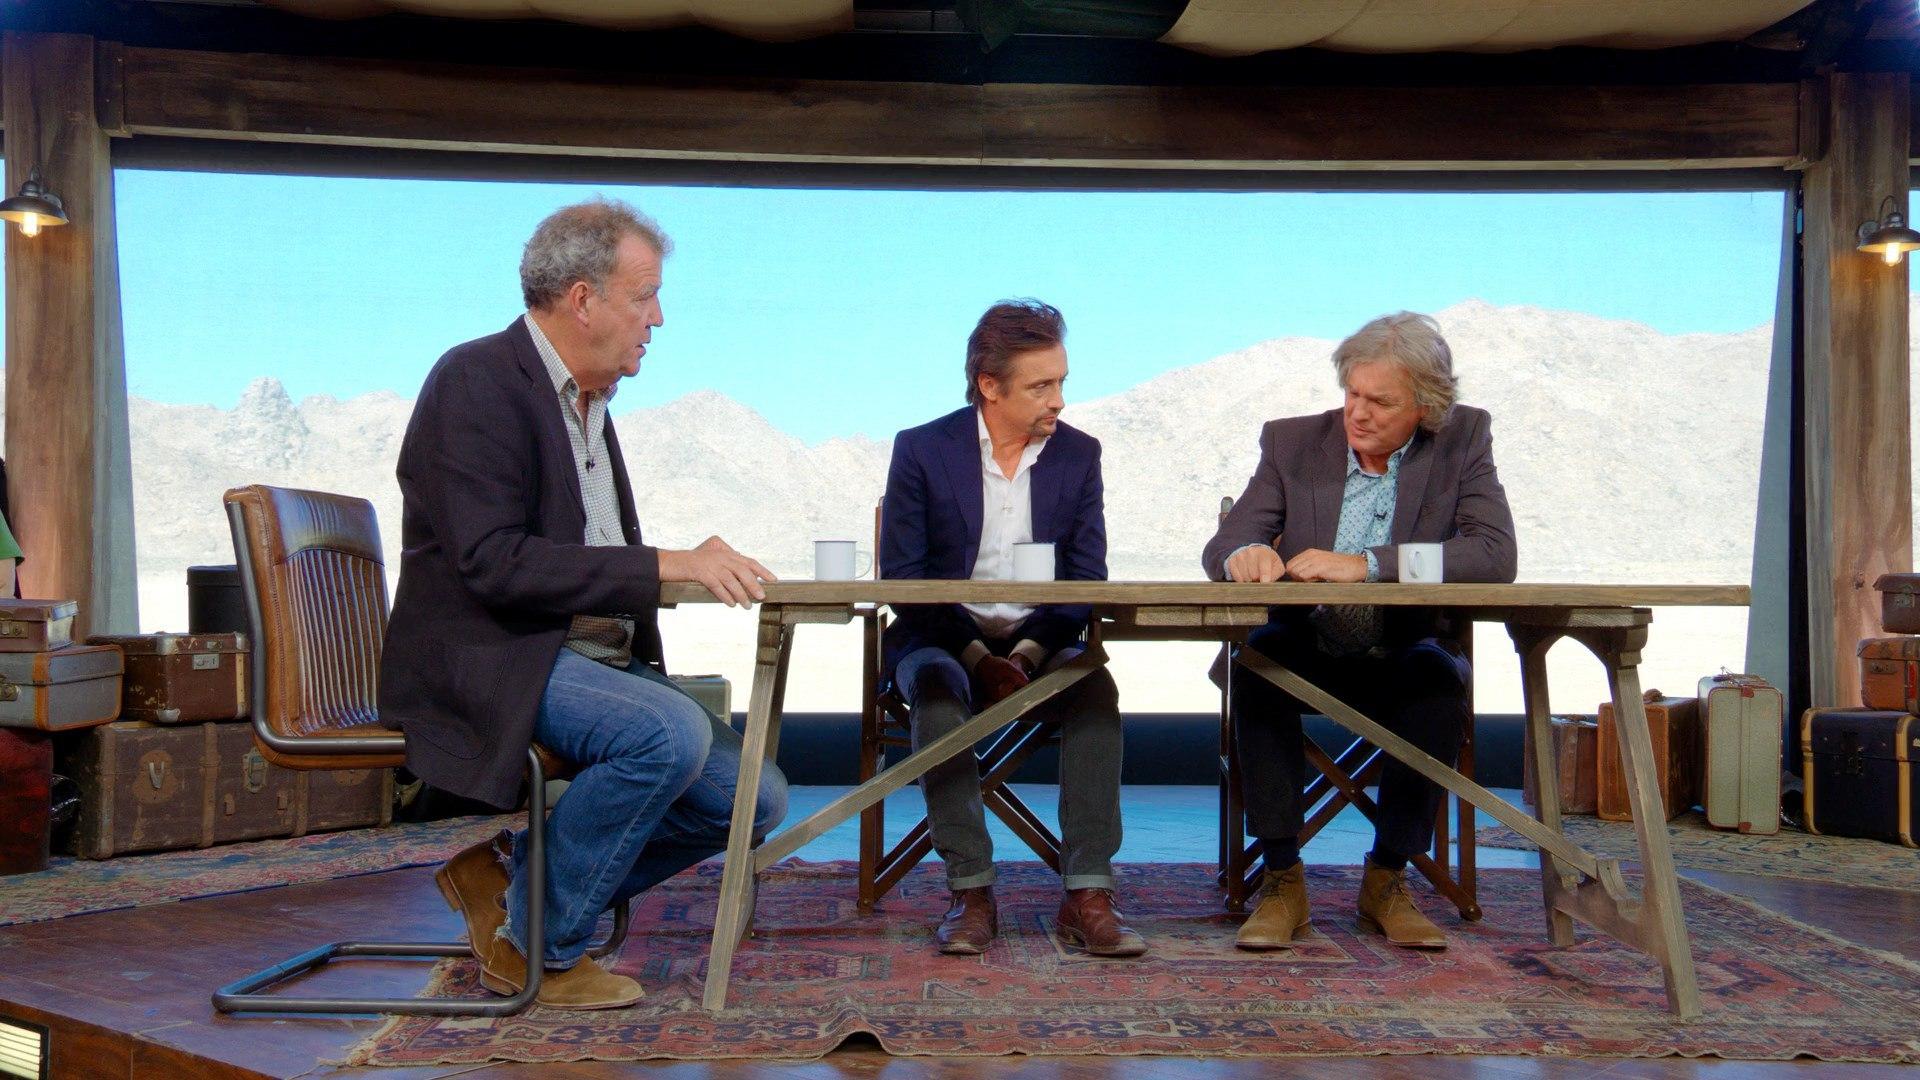 Гранд тур / The Grand Tour [S01] (2016) WEBRip 1080p | AlexFilm скачать торрент с rutor org с rutor org